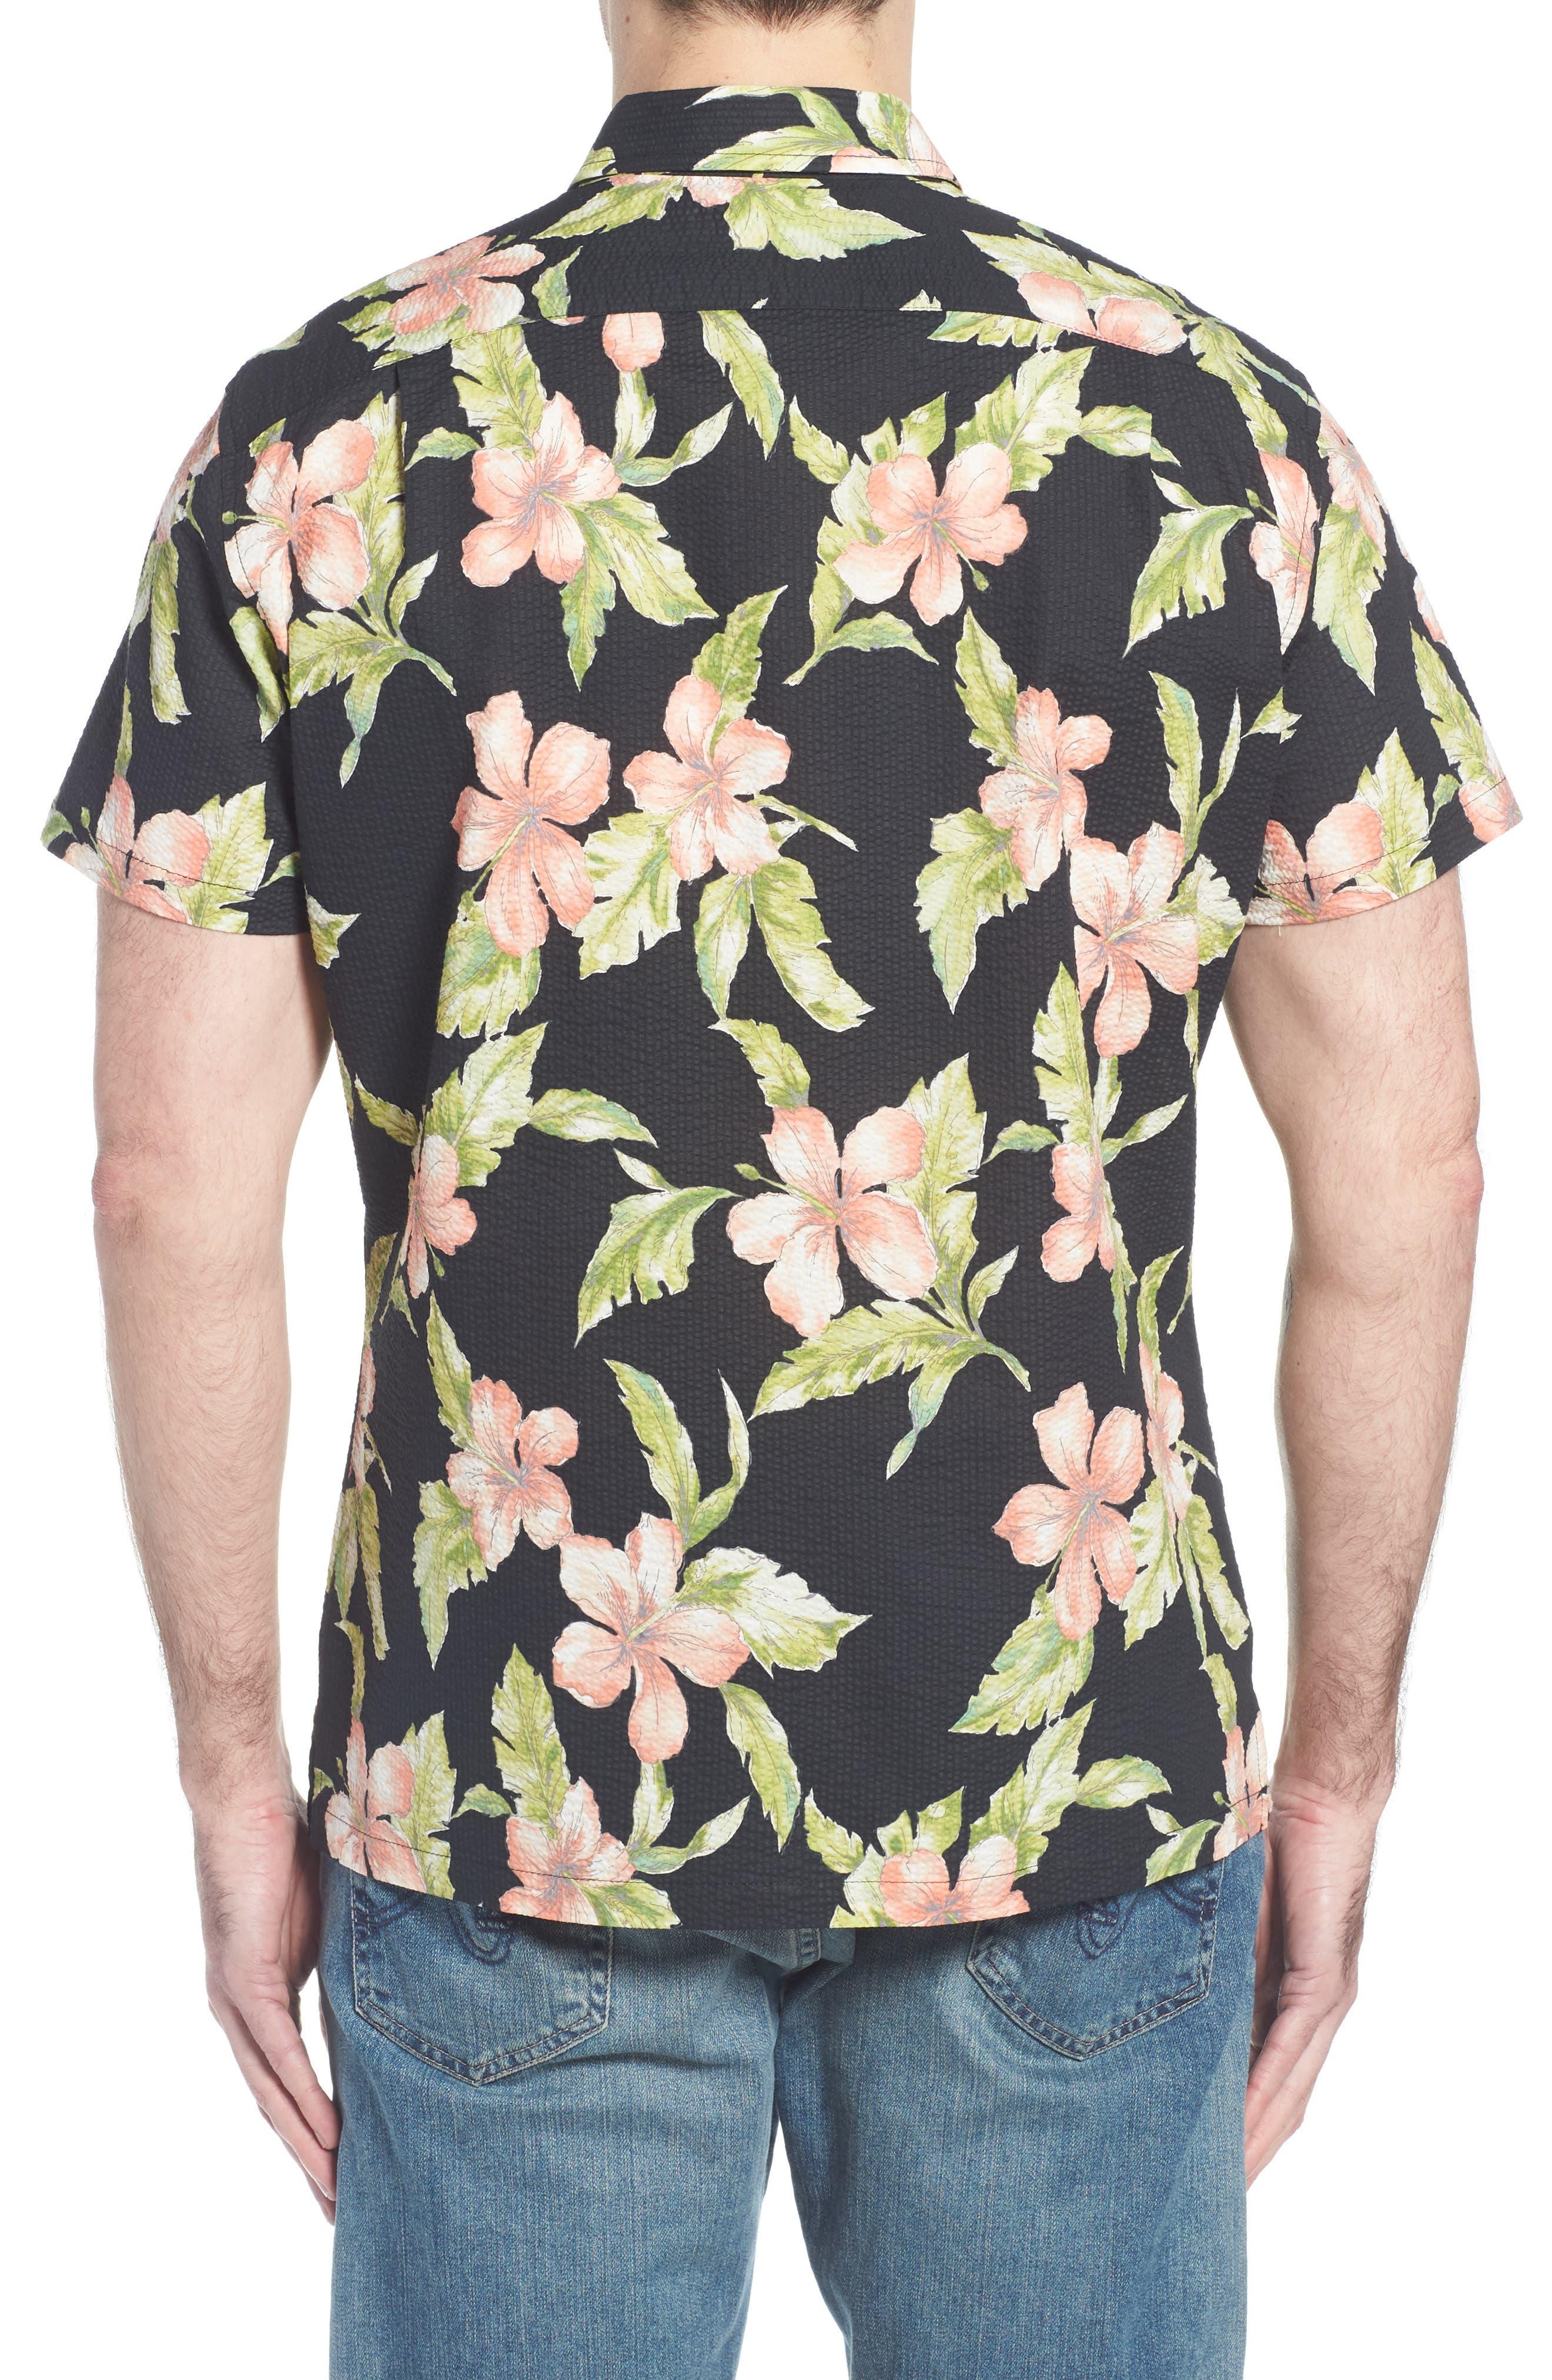 Bahia Trim Fit Camp Shirt,                             Alternate thumbnail 4, color,                             Black